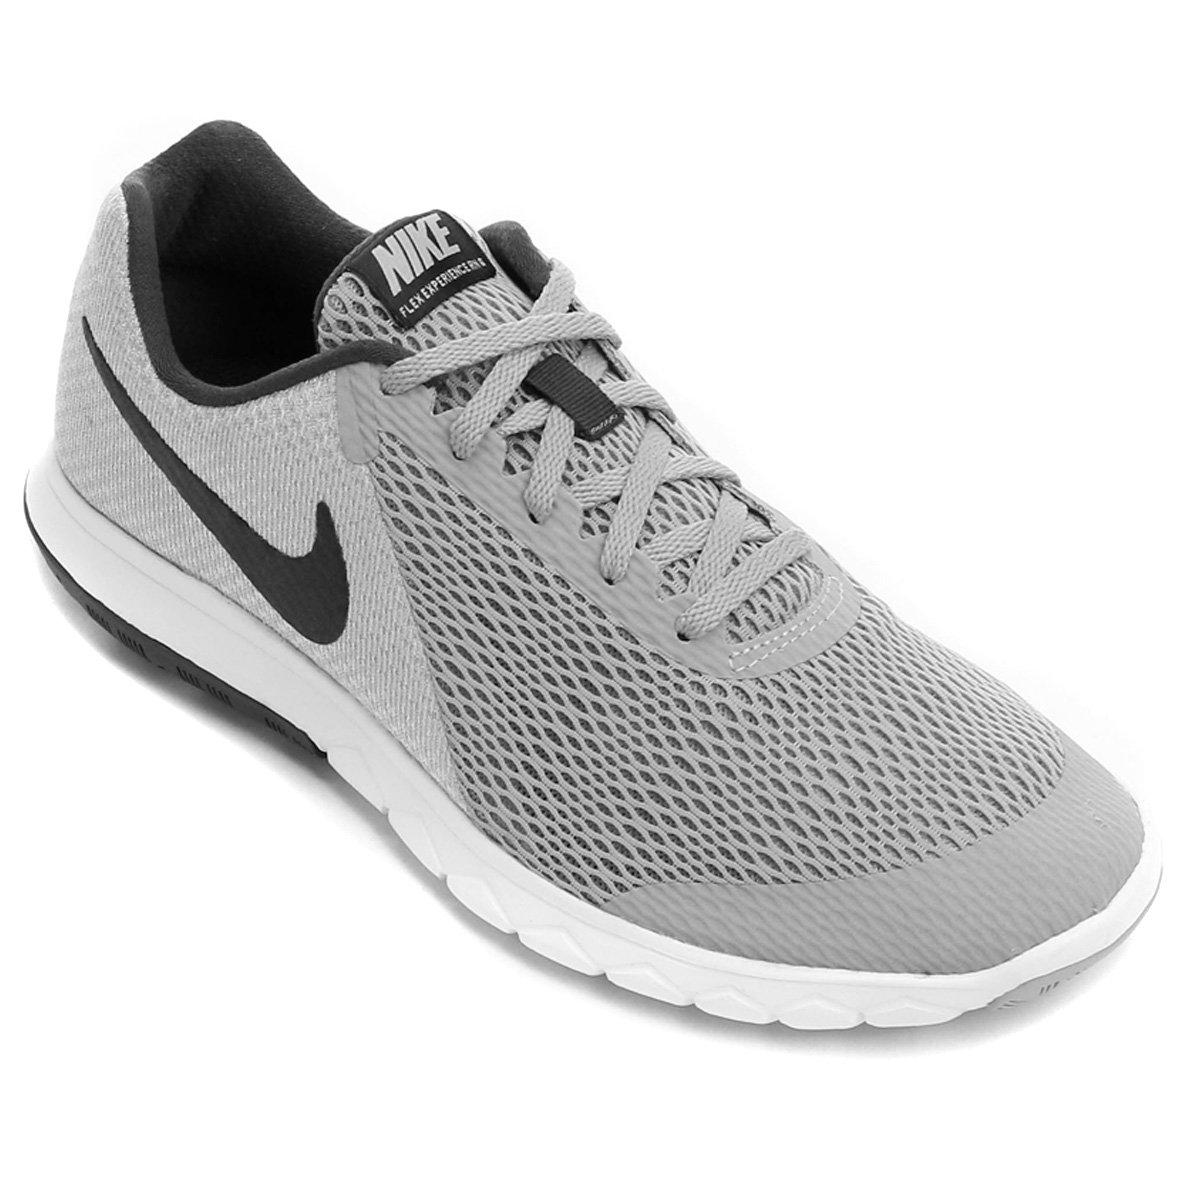 Tênis Nike Flex Experience Rn 6 Masculino - Compre Agora  cb5f96510dc7c